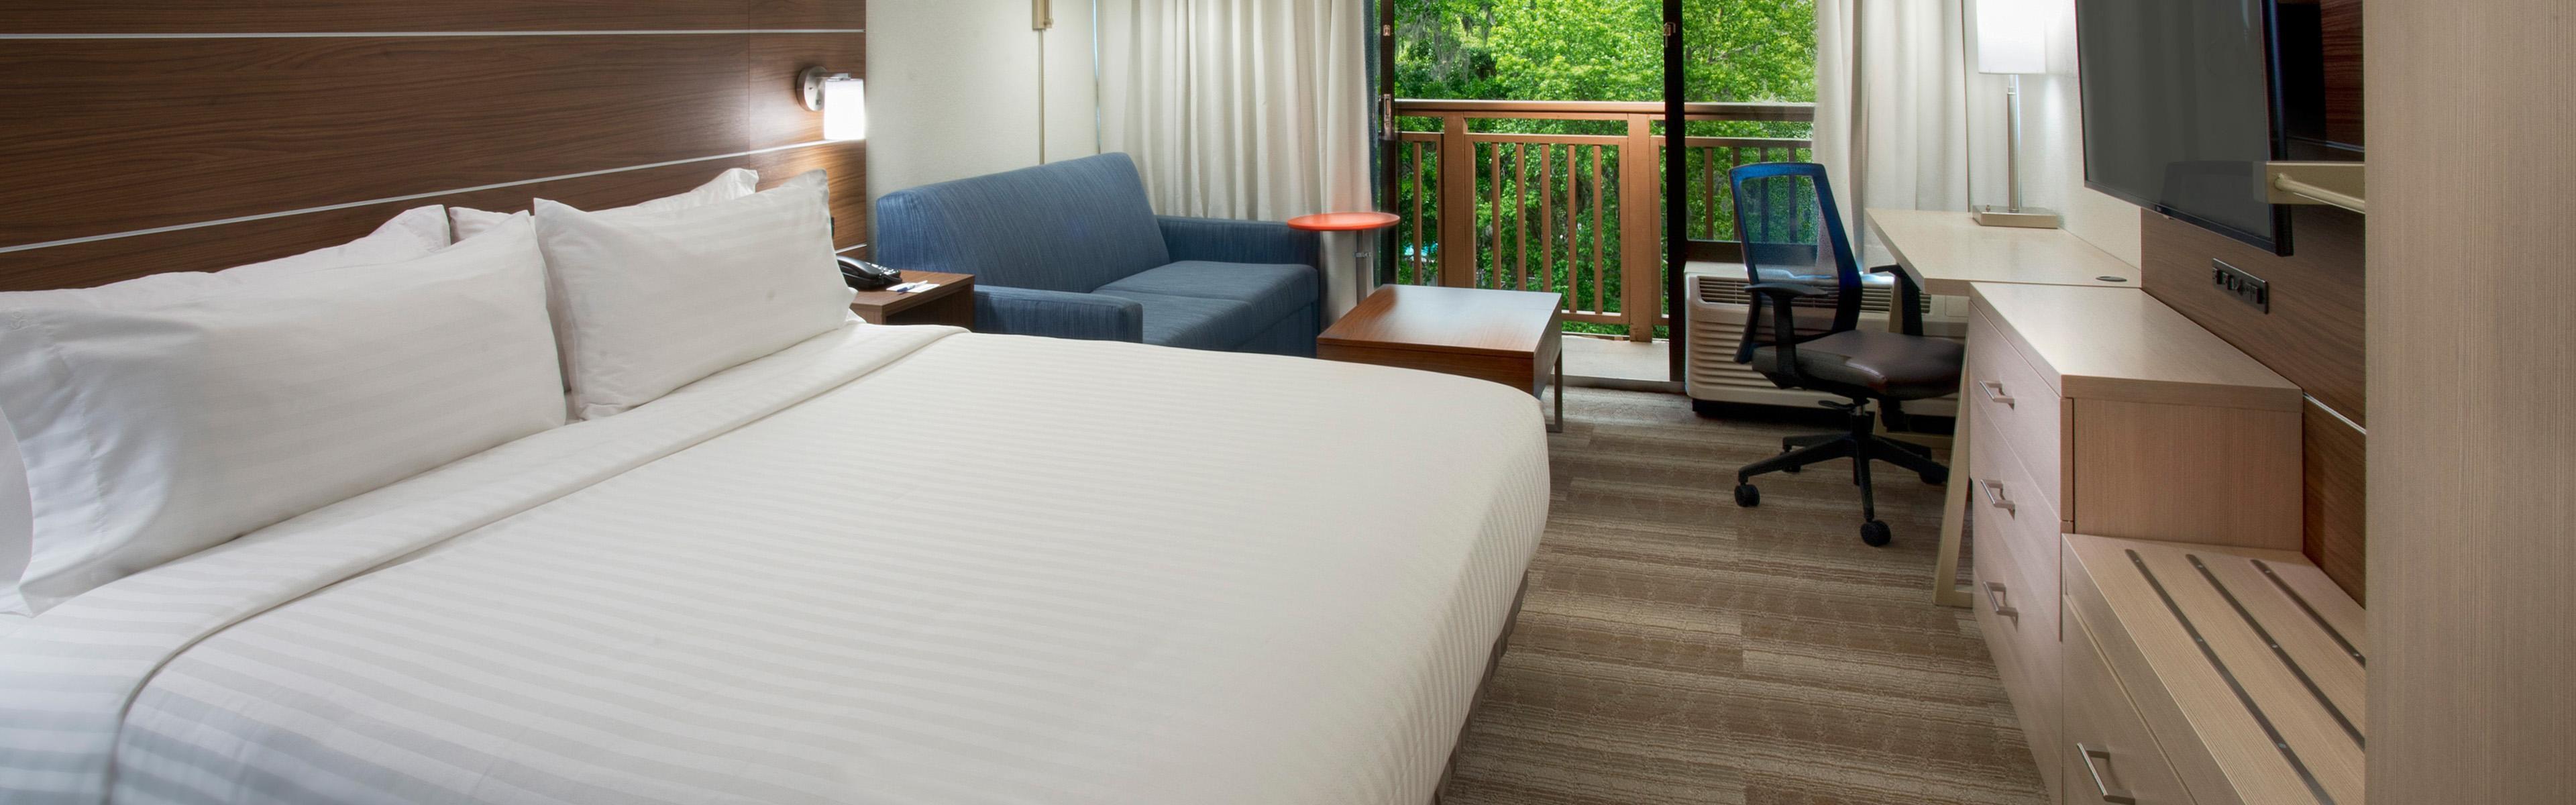 Holiday Inn Express Hilton Head Island image 1